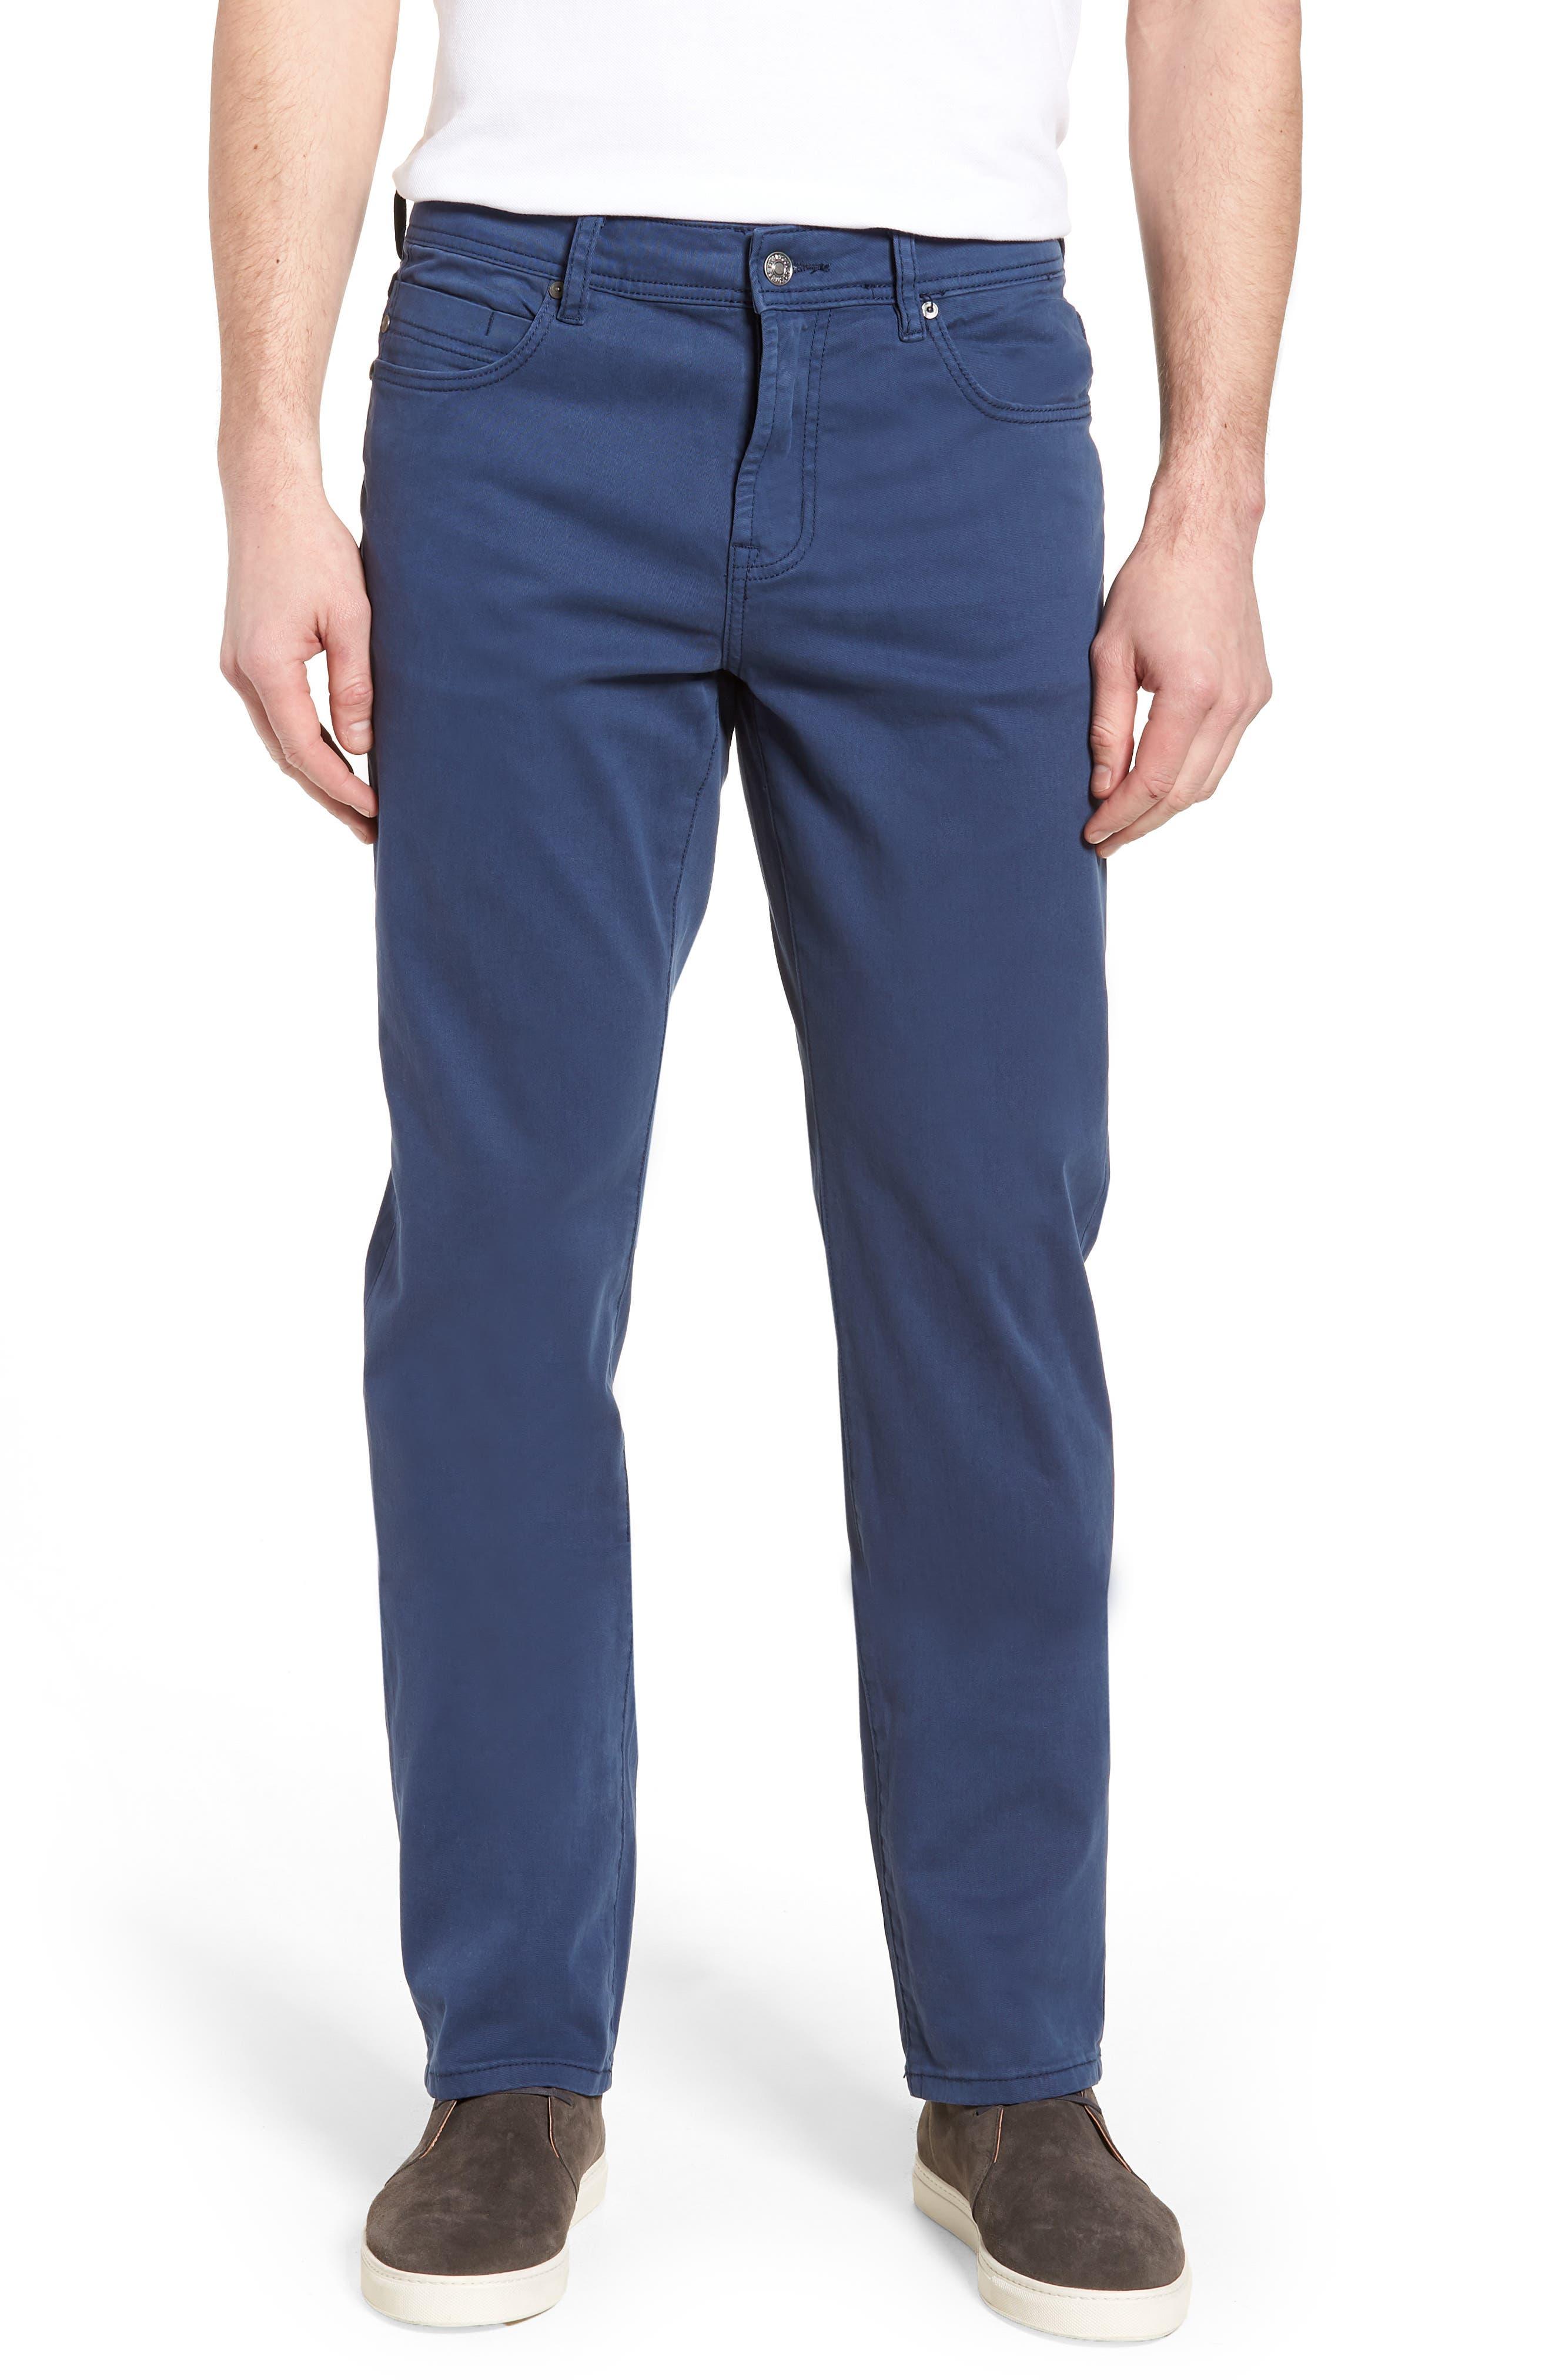 Jeans Co. Regent Relaxed Straight Leg Jeans,                             Main thumbnail 1, color,                             BLUE TWILIGHT